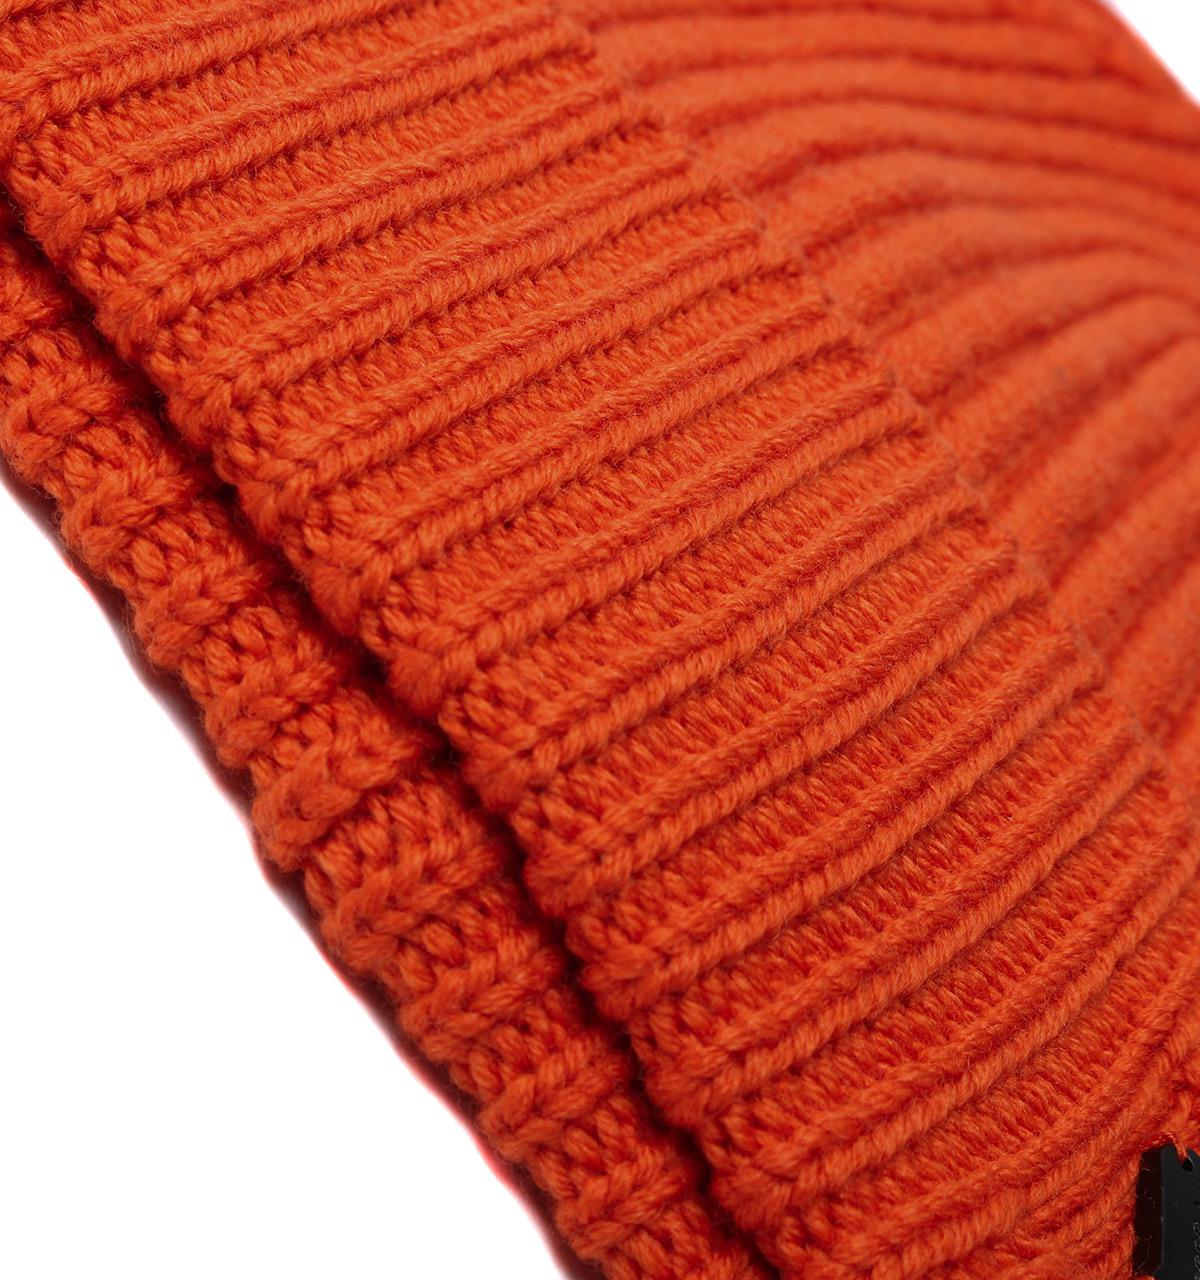 0e0d5f51e00 Armani Jeans - Orange Woollen Rib Knit Beanie Hat for Men - Lyst. View  fullscreen